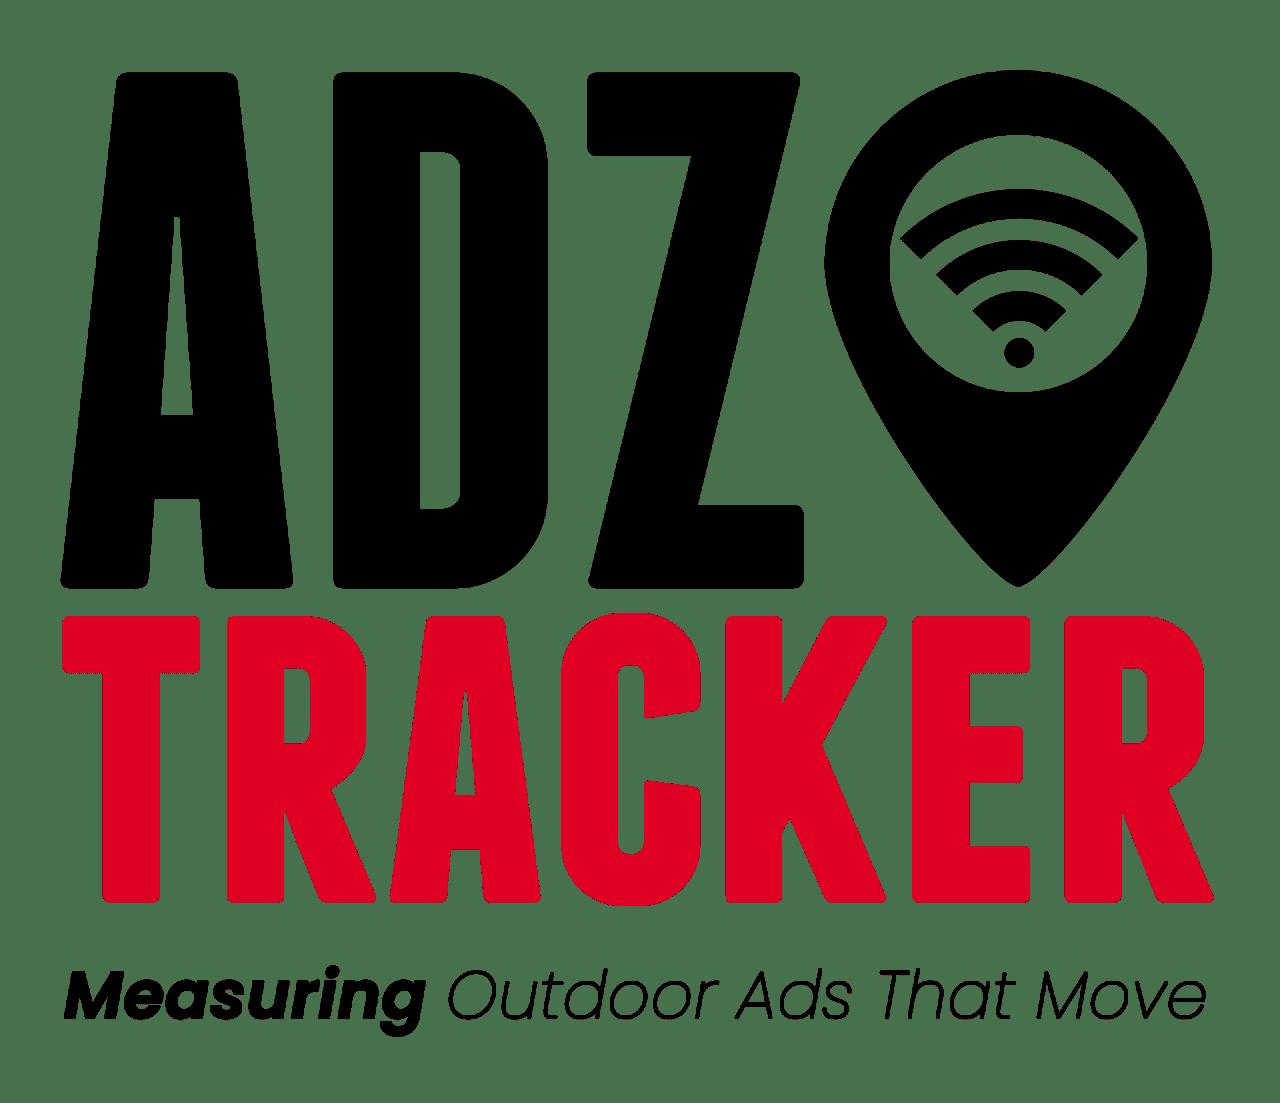 https://www.truckadz.co.uk/wp-content/uploads/2021/03/Adz-Tracker-V1-1-1280x1103.png